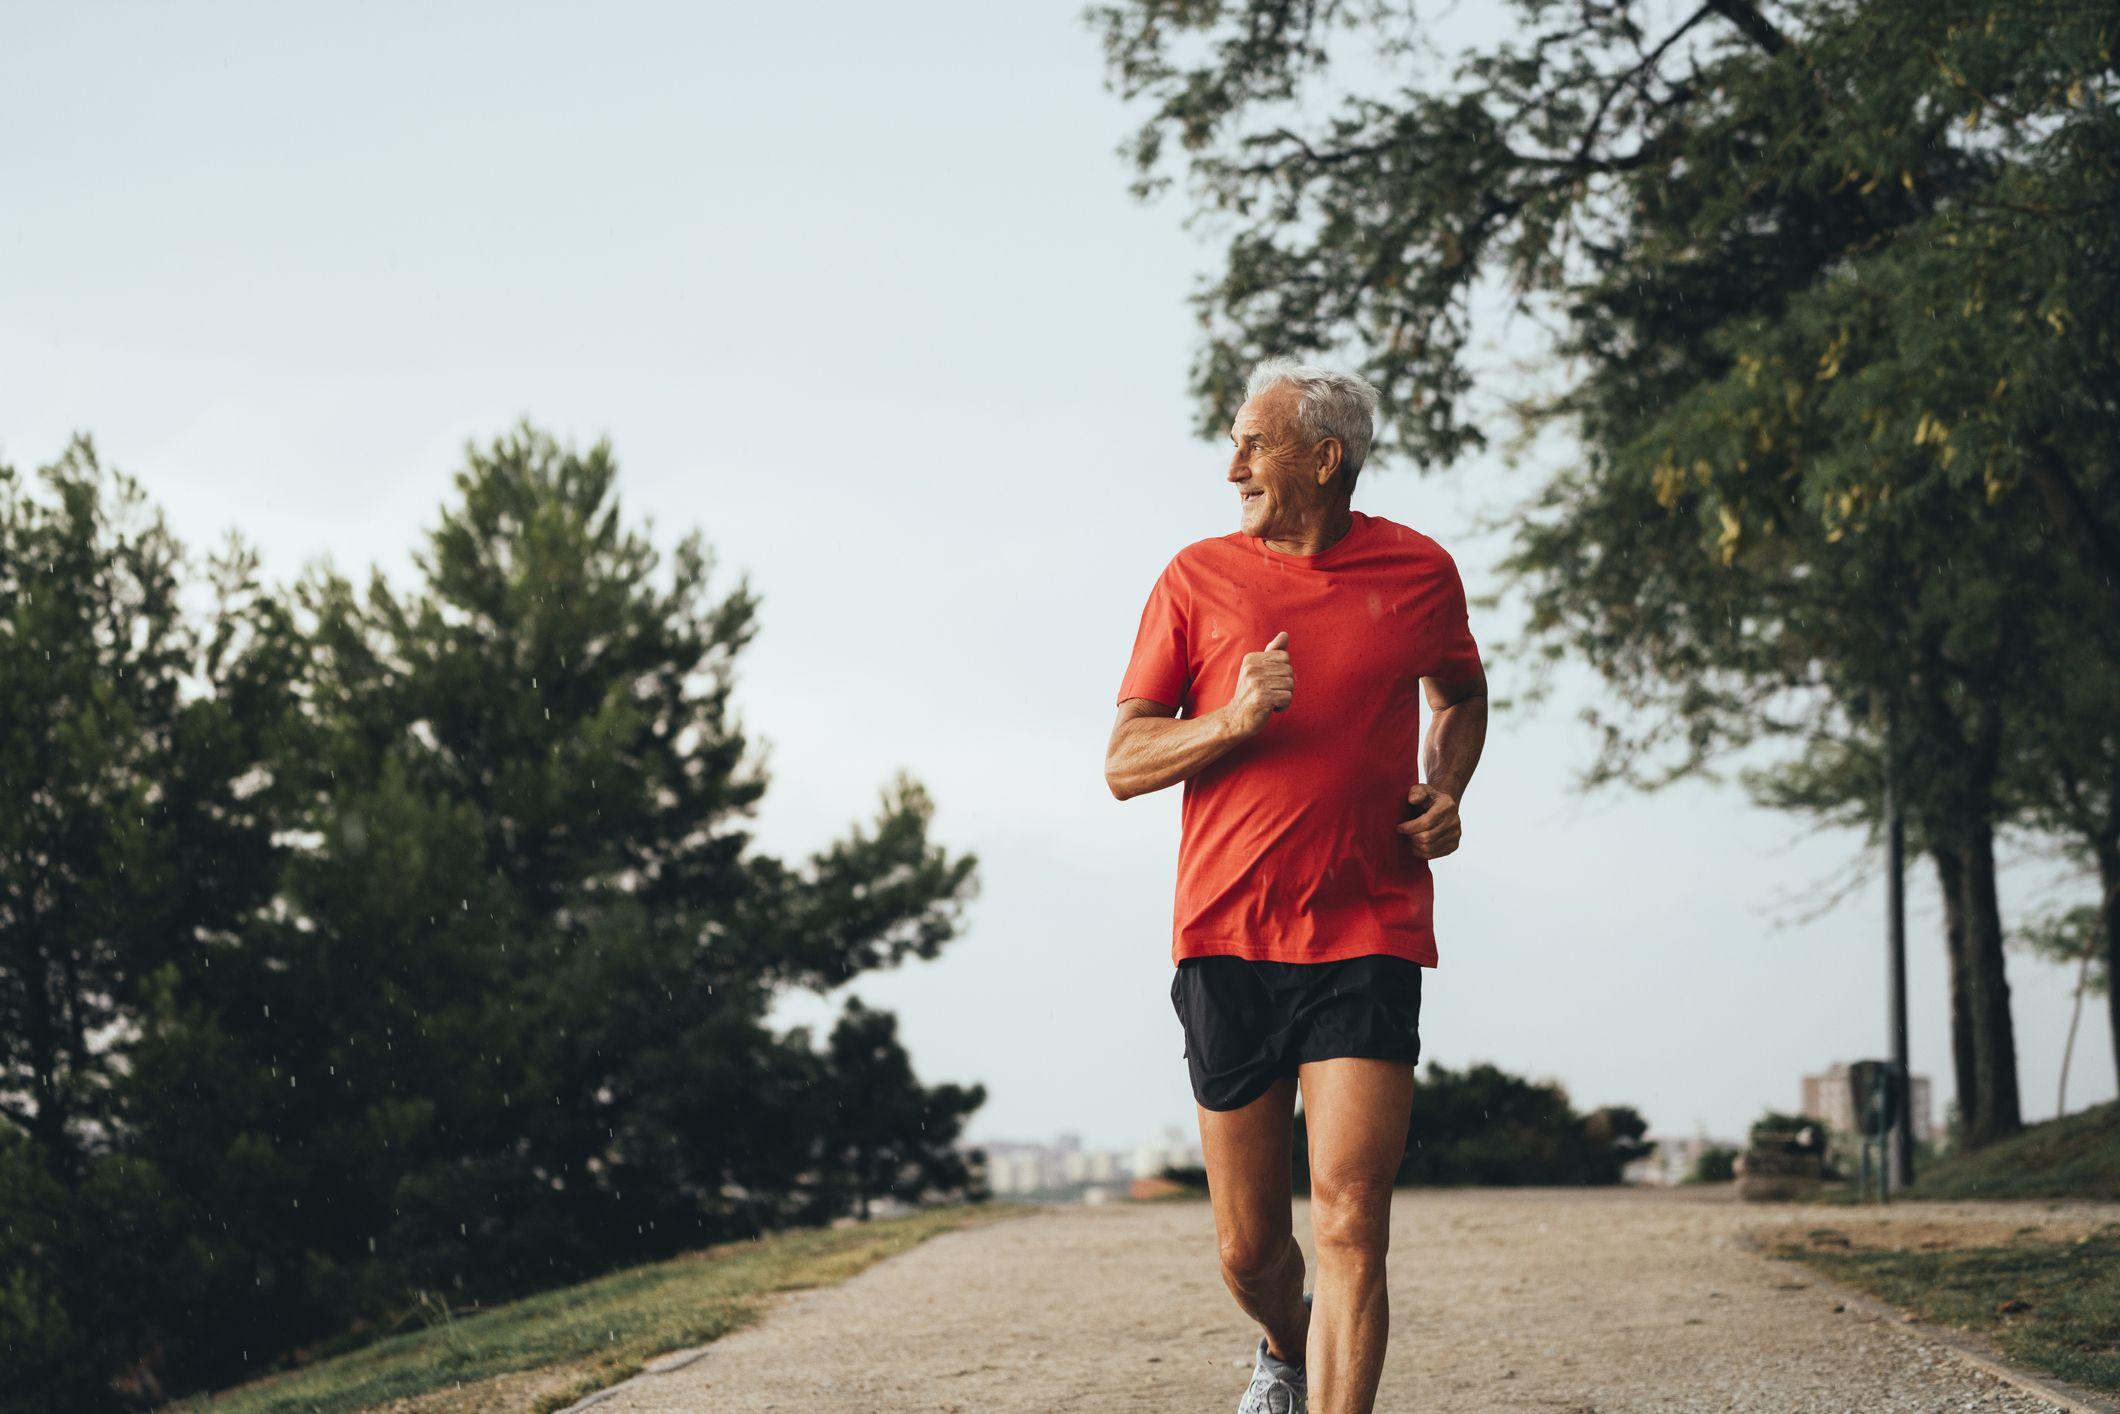 Elderly man jogging